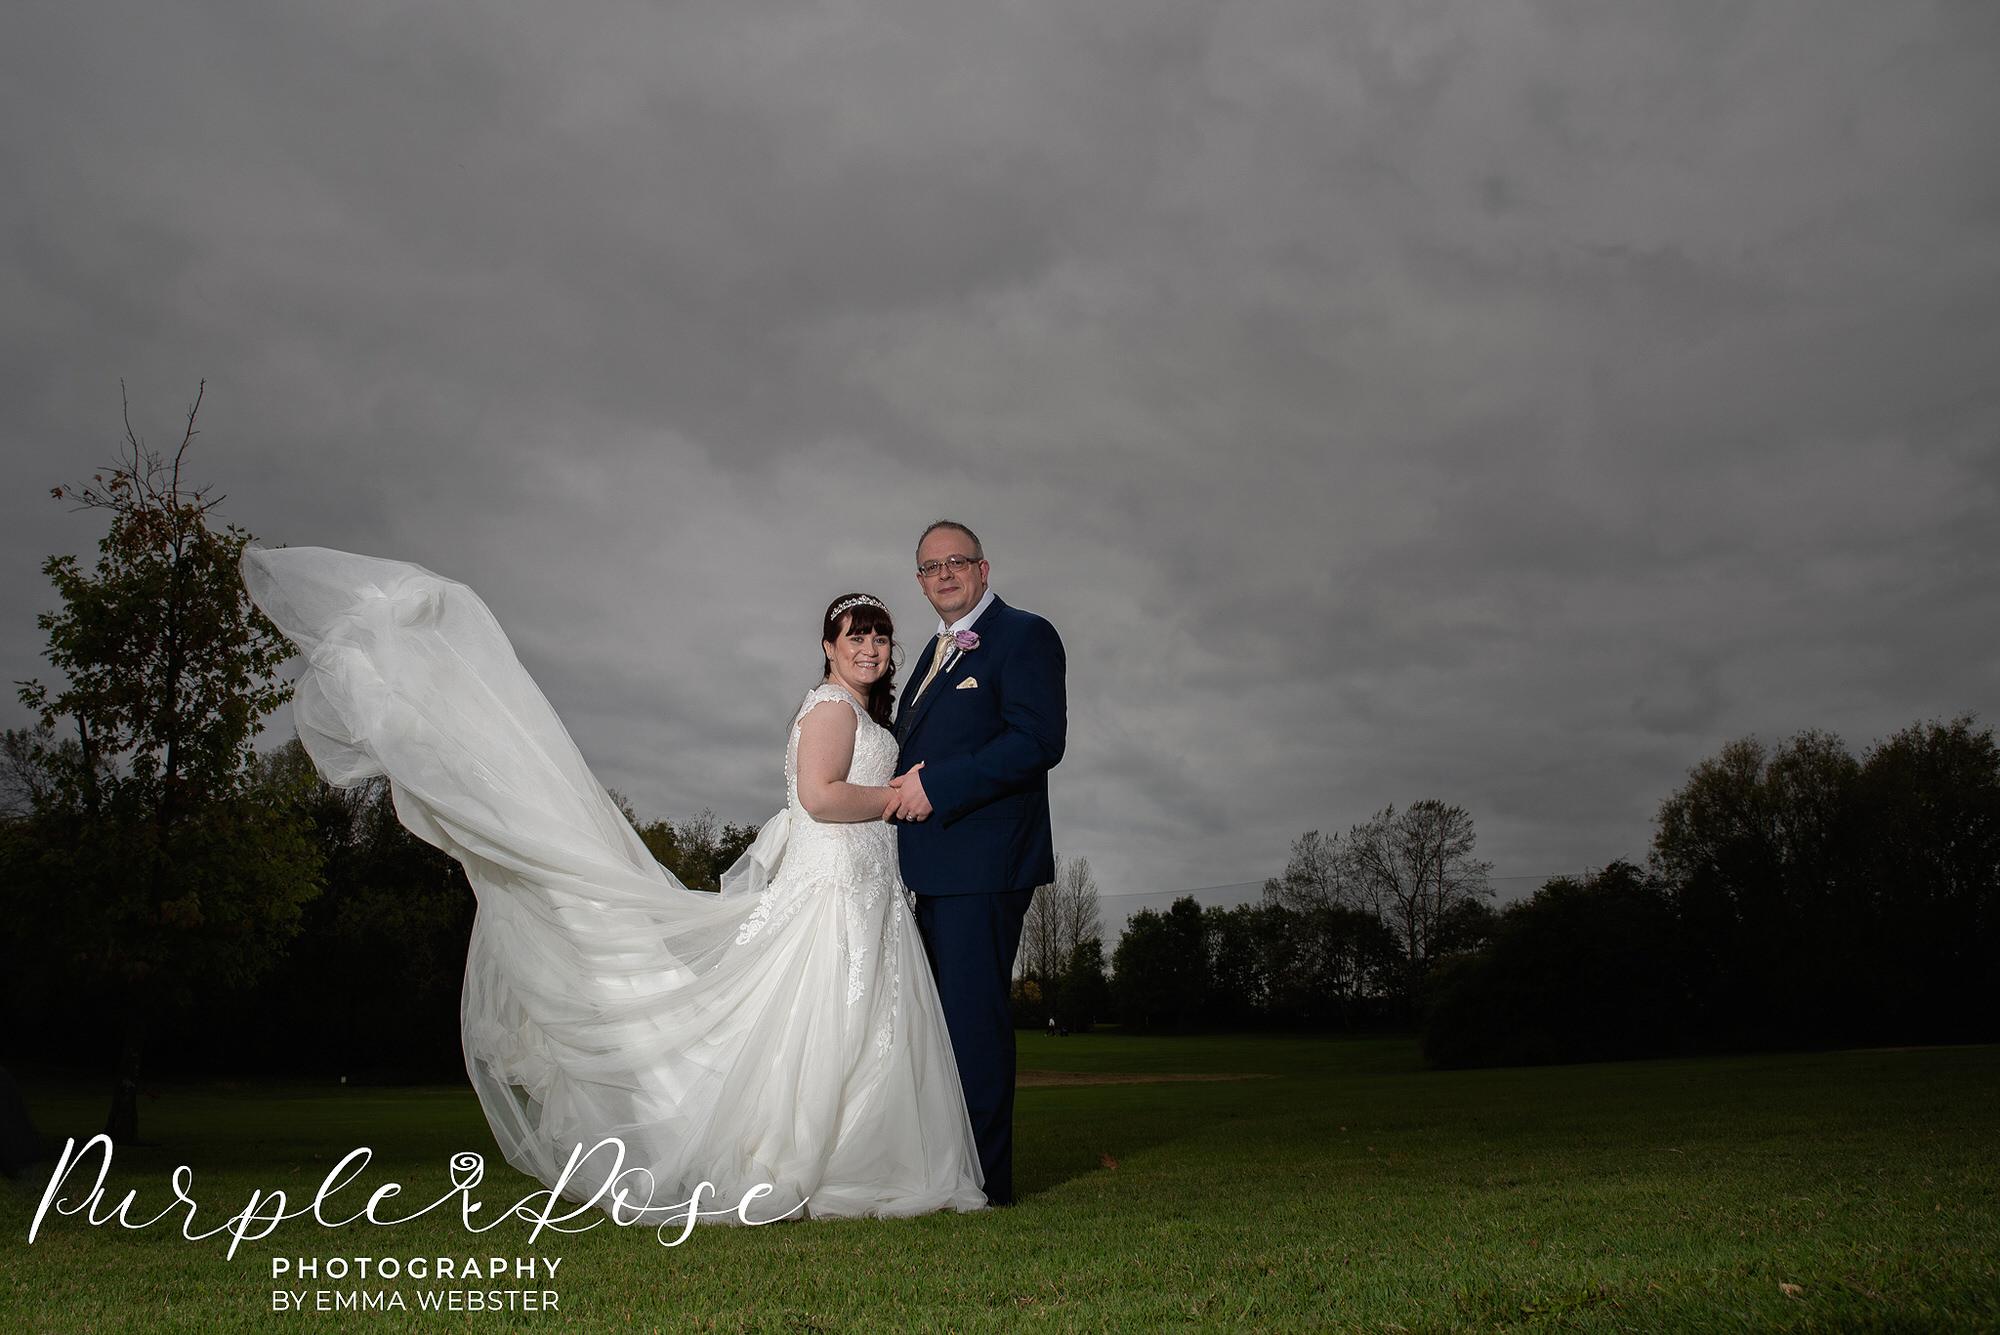 Brides dress flowing